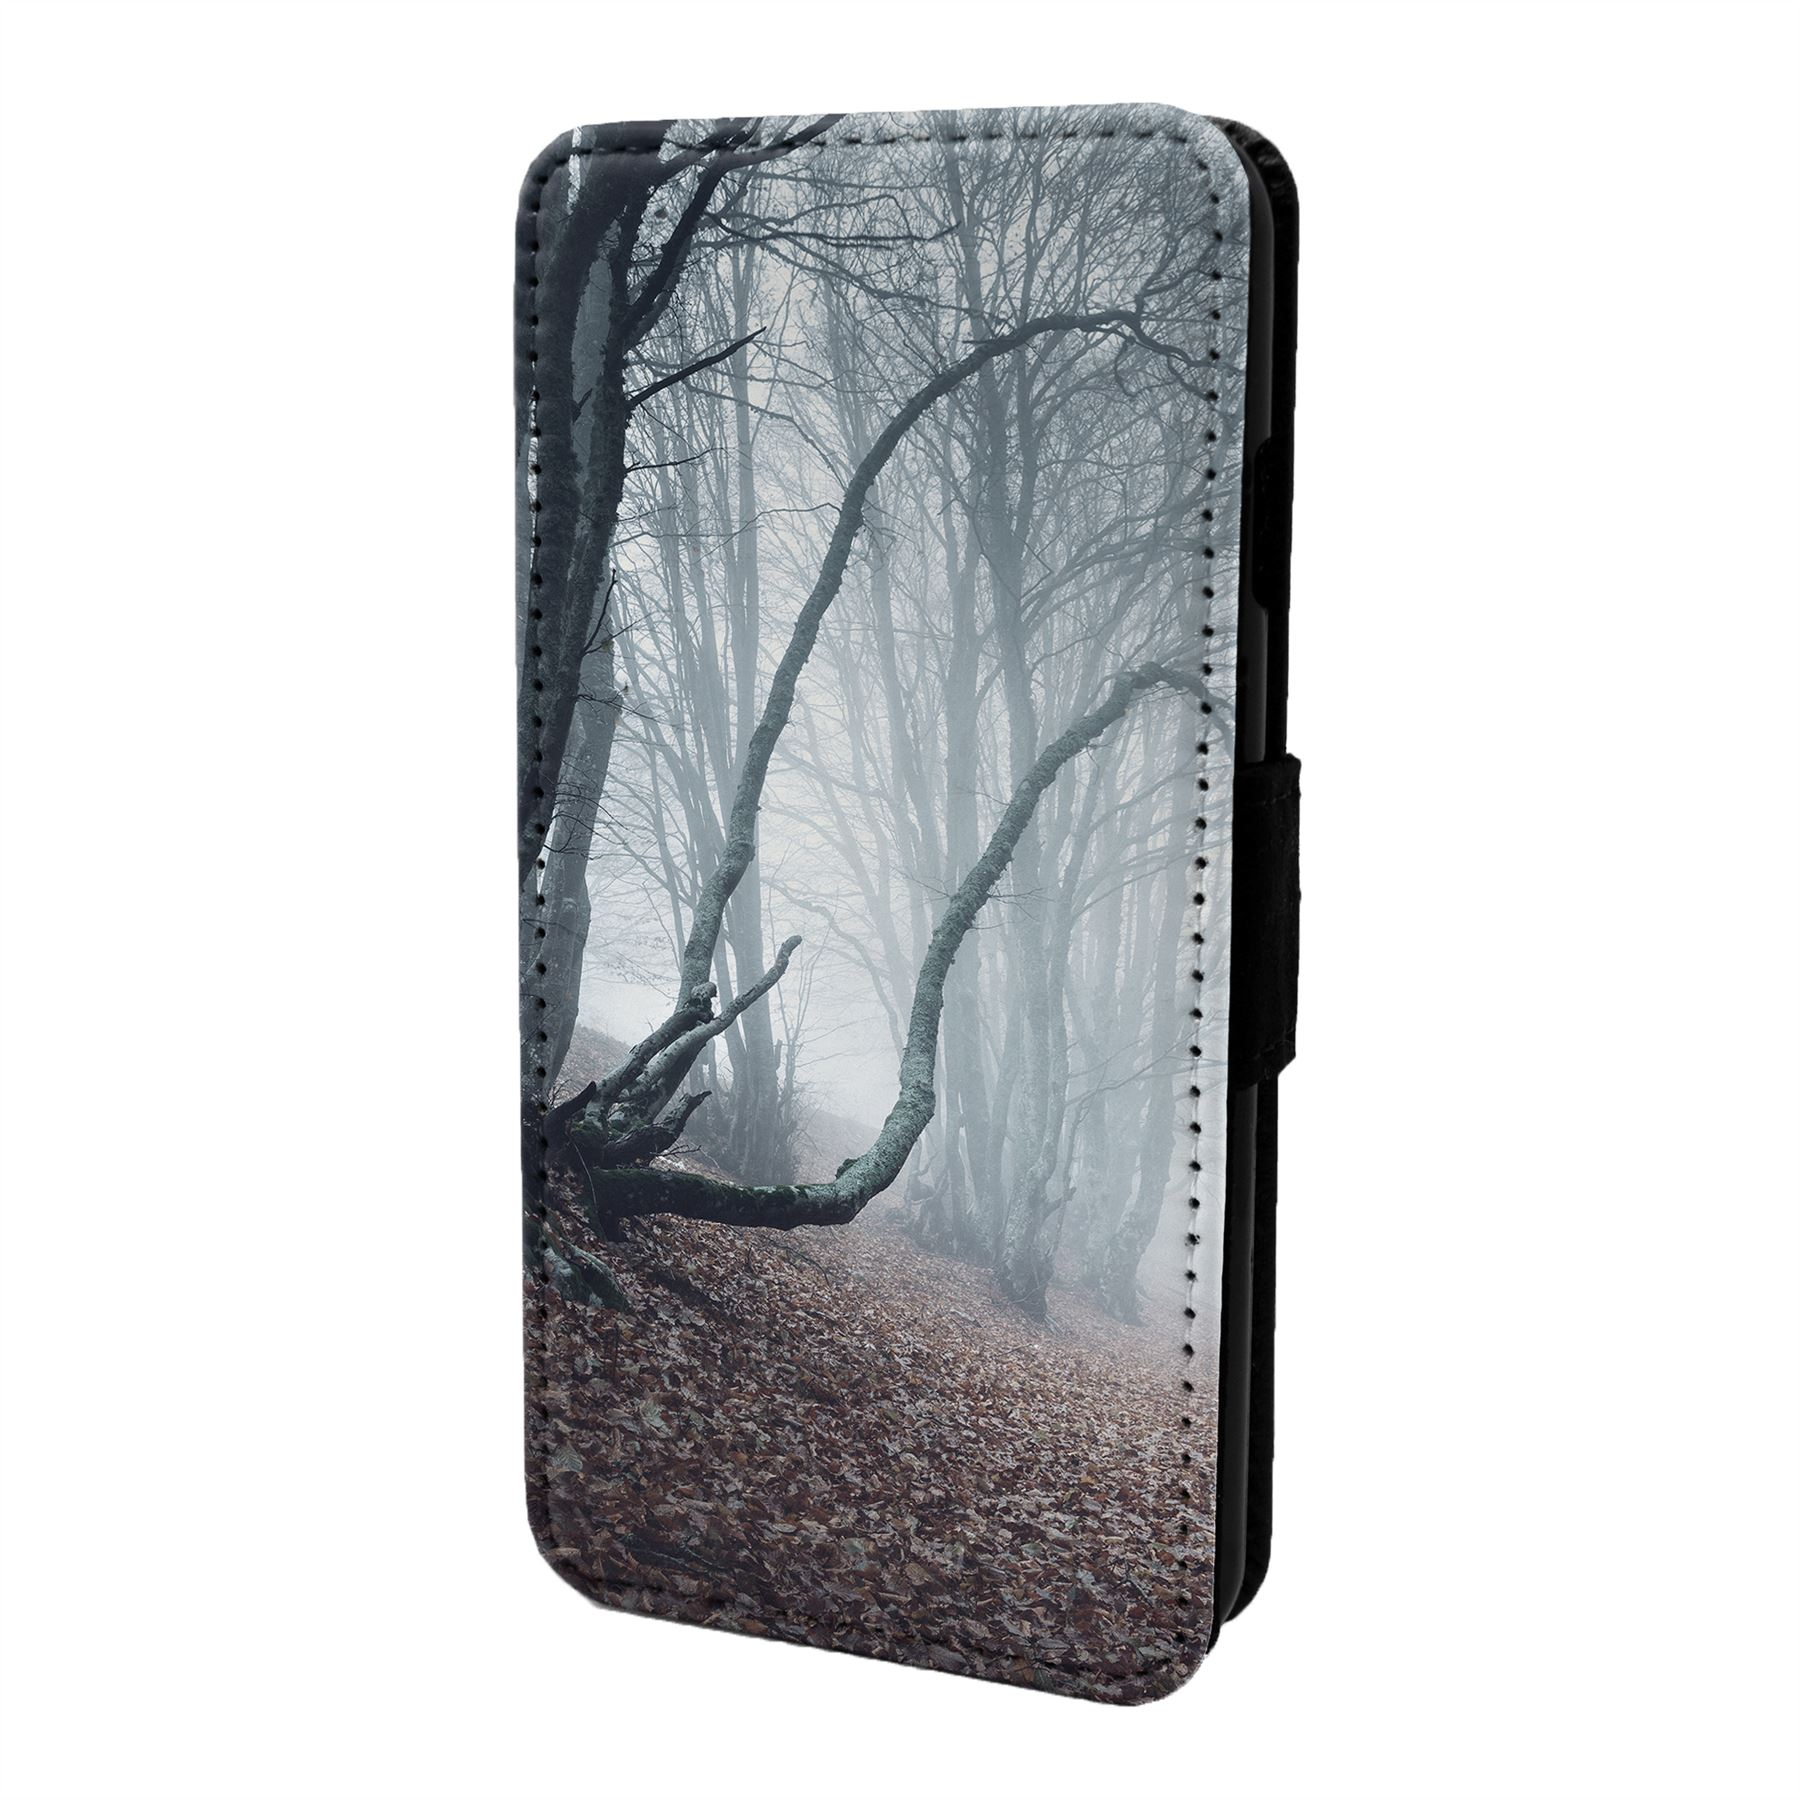 Magico-Paisaje-Estampado-Funda-Libro-para-Telefono-Movil-S6872